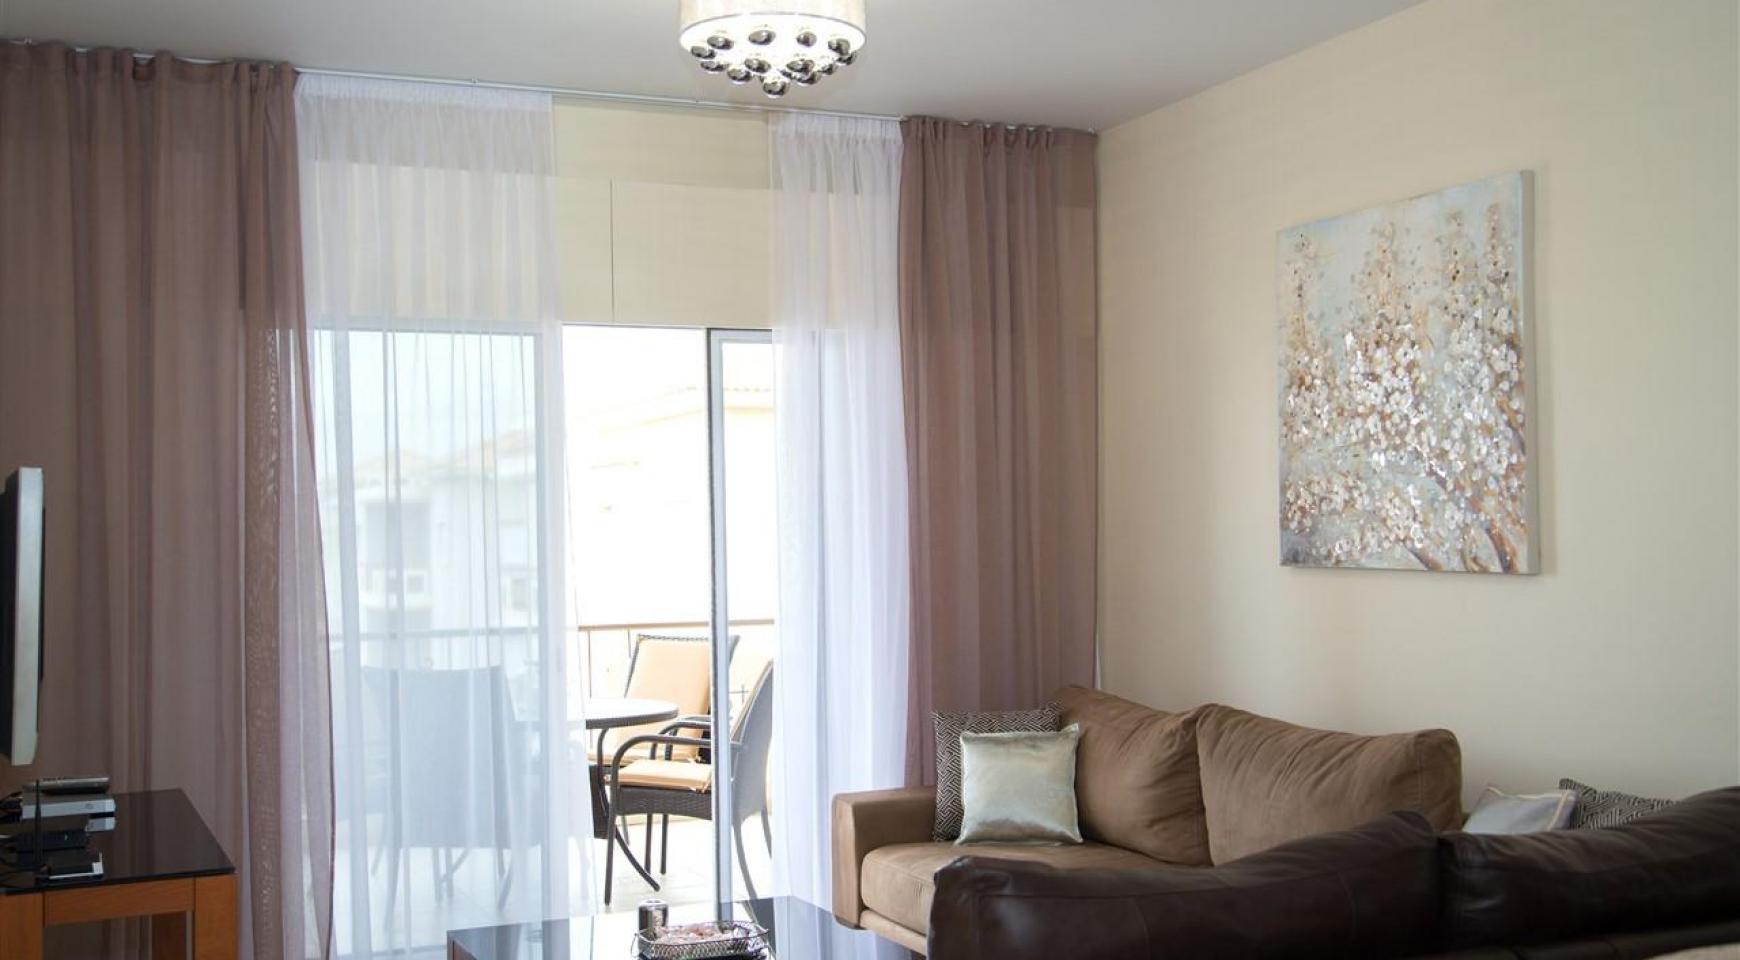 Luxury 2 Bedroom Apartment Mesogios Iris 304 in the Tourist area near the Beach - 1